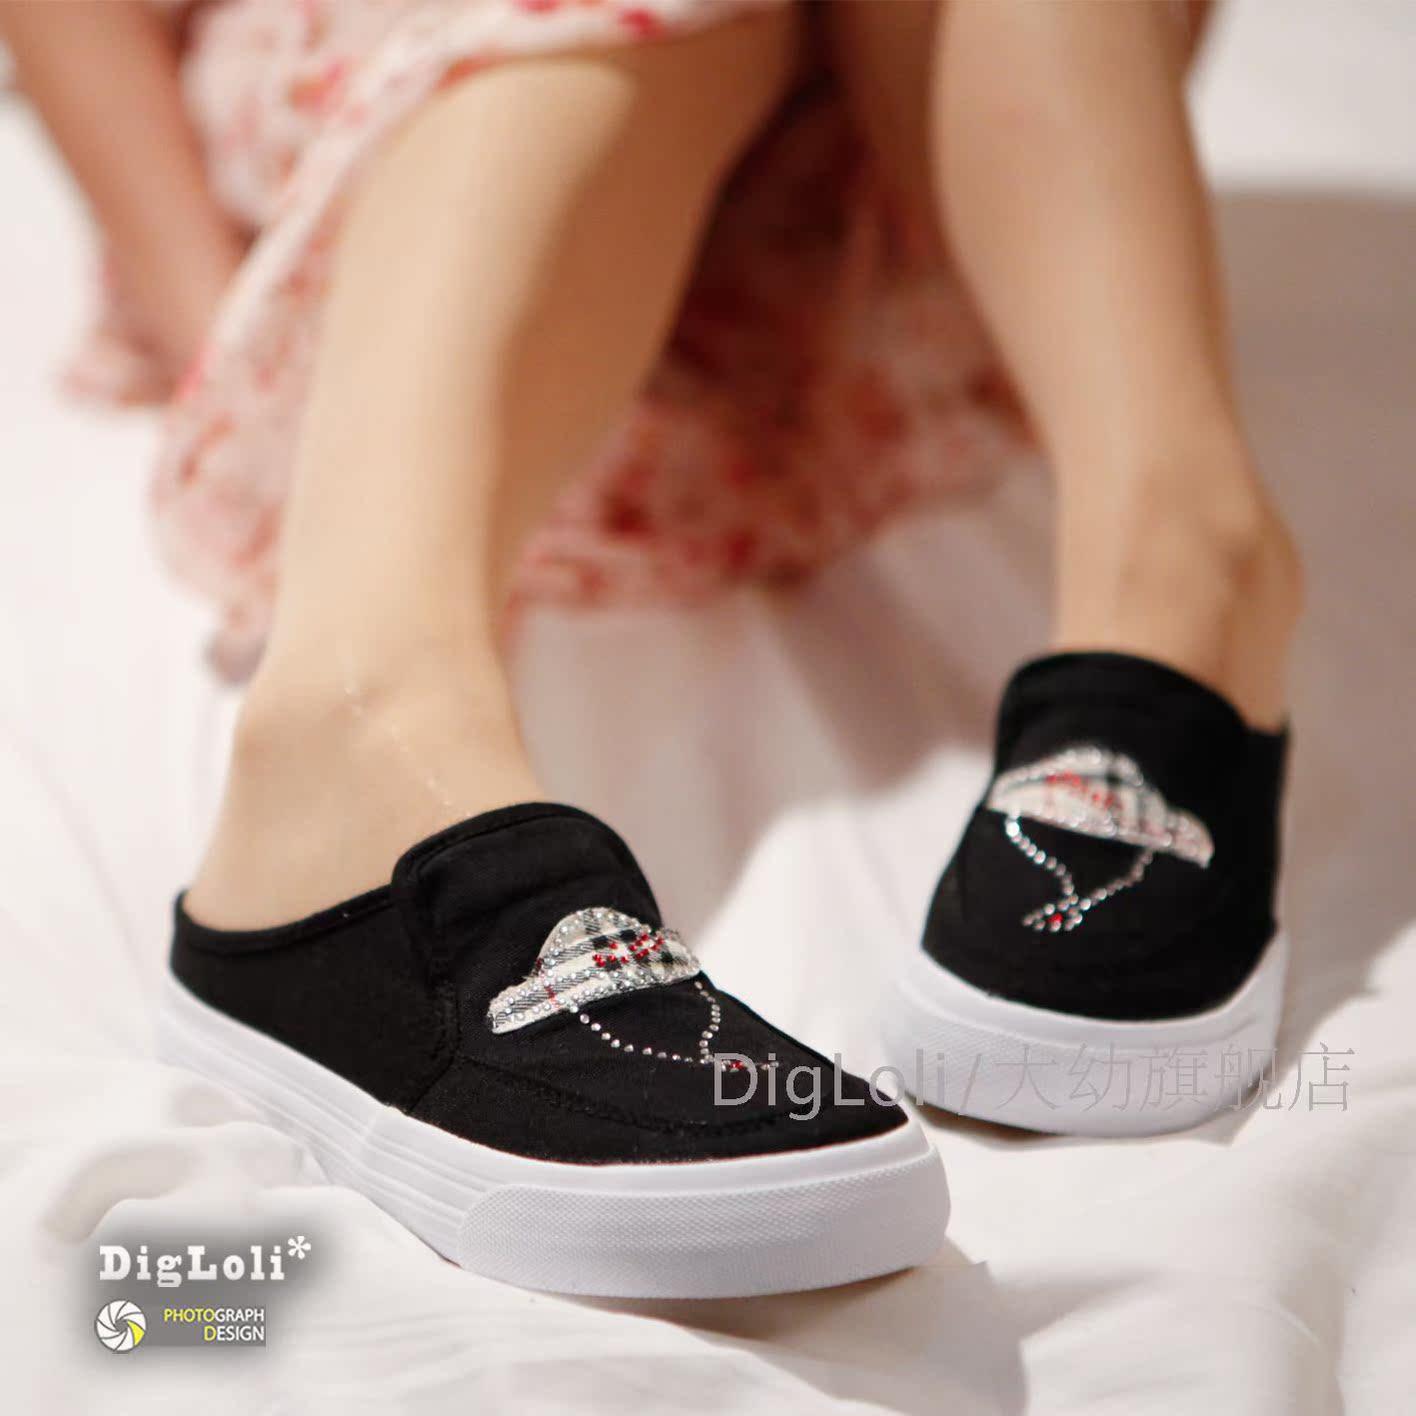 [DigLoli]仅19元限前50位极限价!韩版一脚蹬防滑套脚懒人鞋女鞋